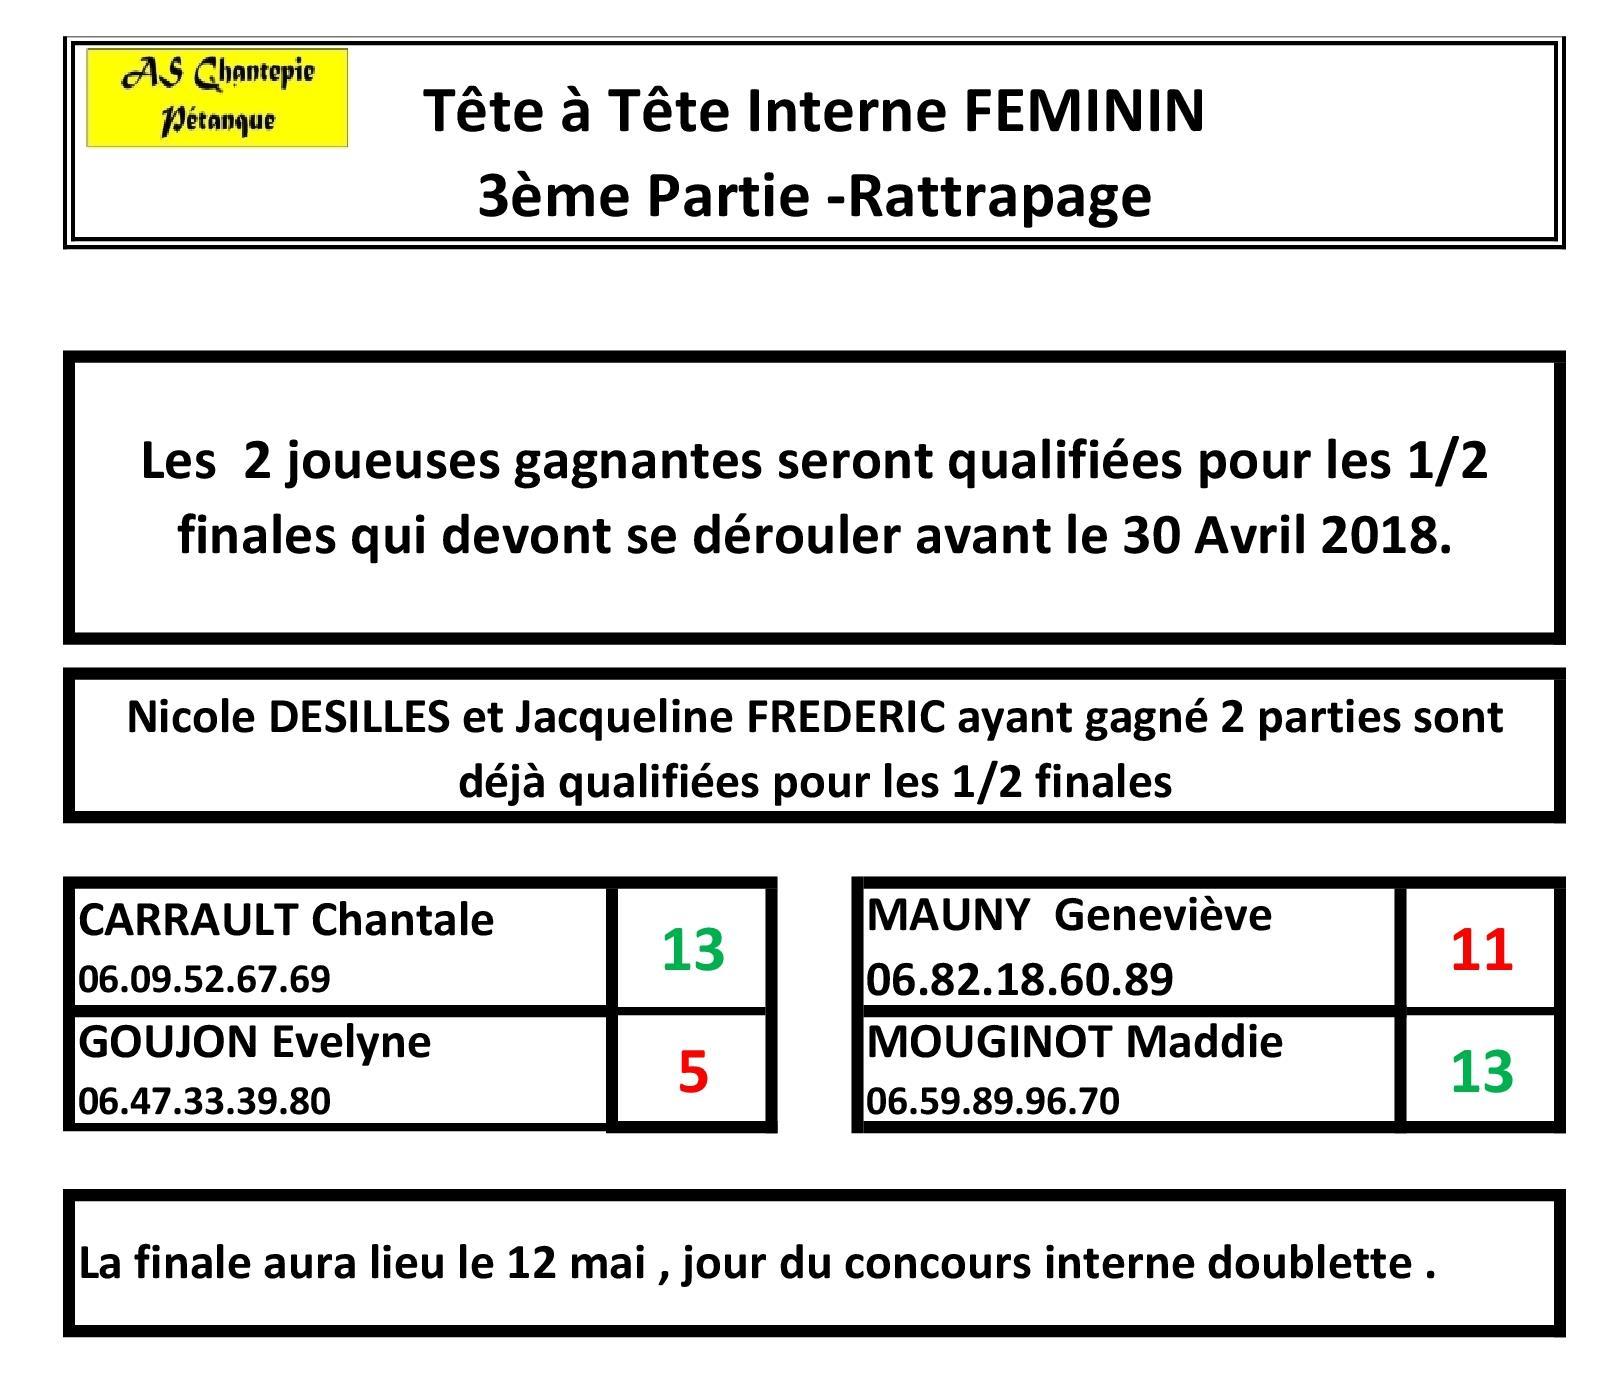 TABLEAU FEMININ 3ème PARTIE - RATTRAPAGE .jpg